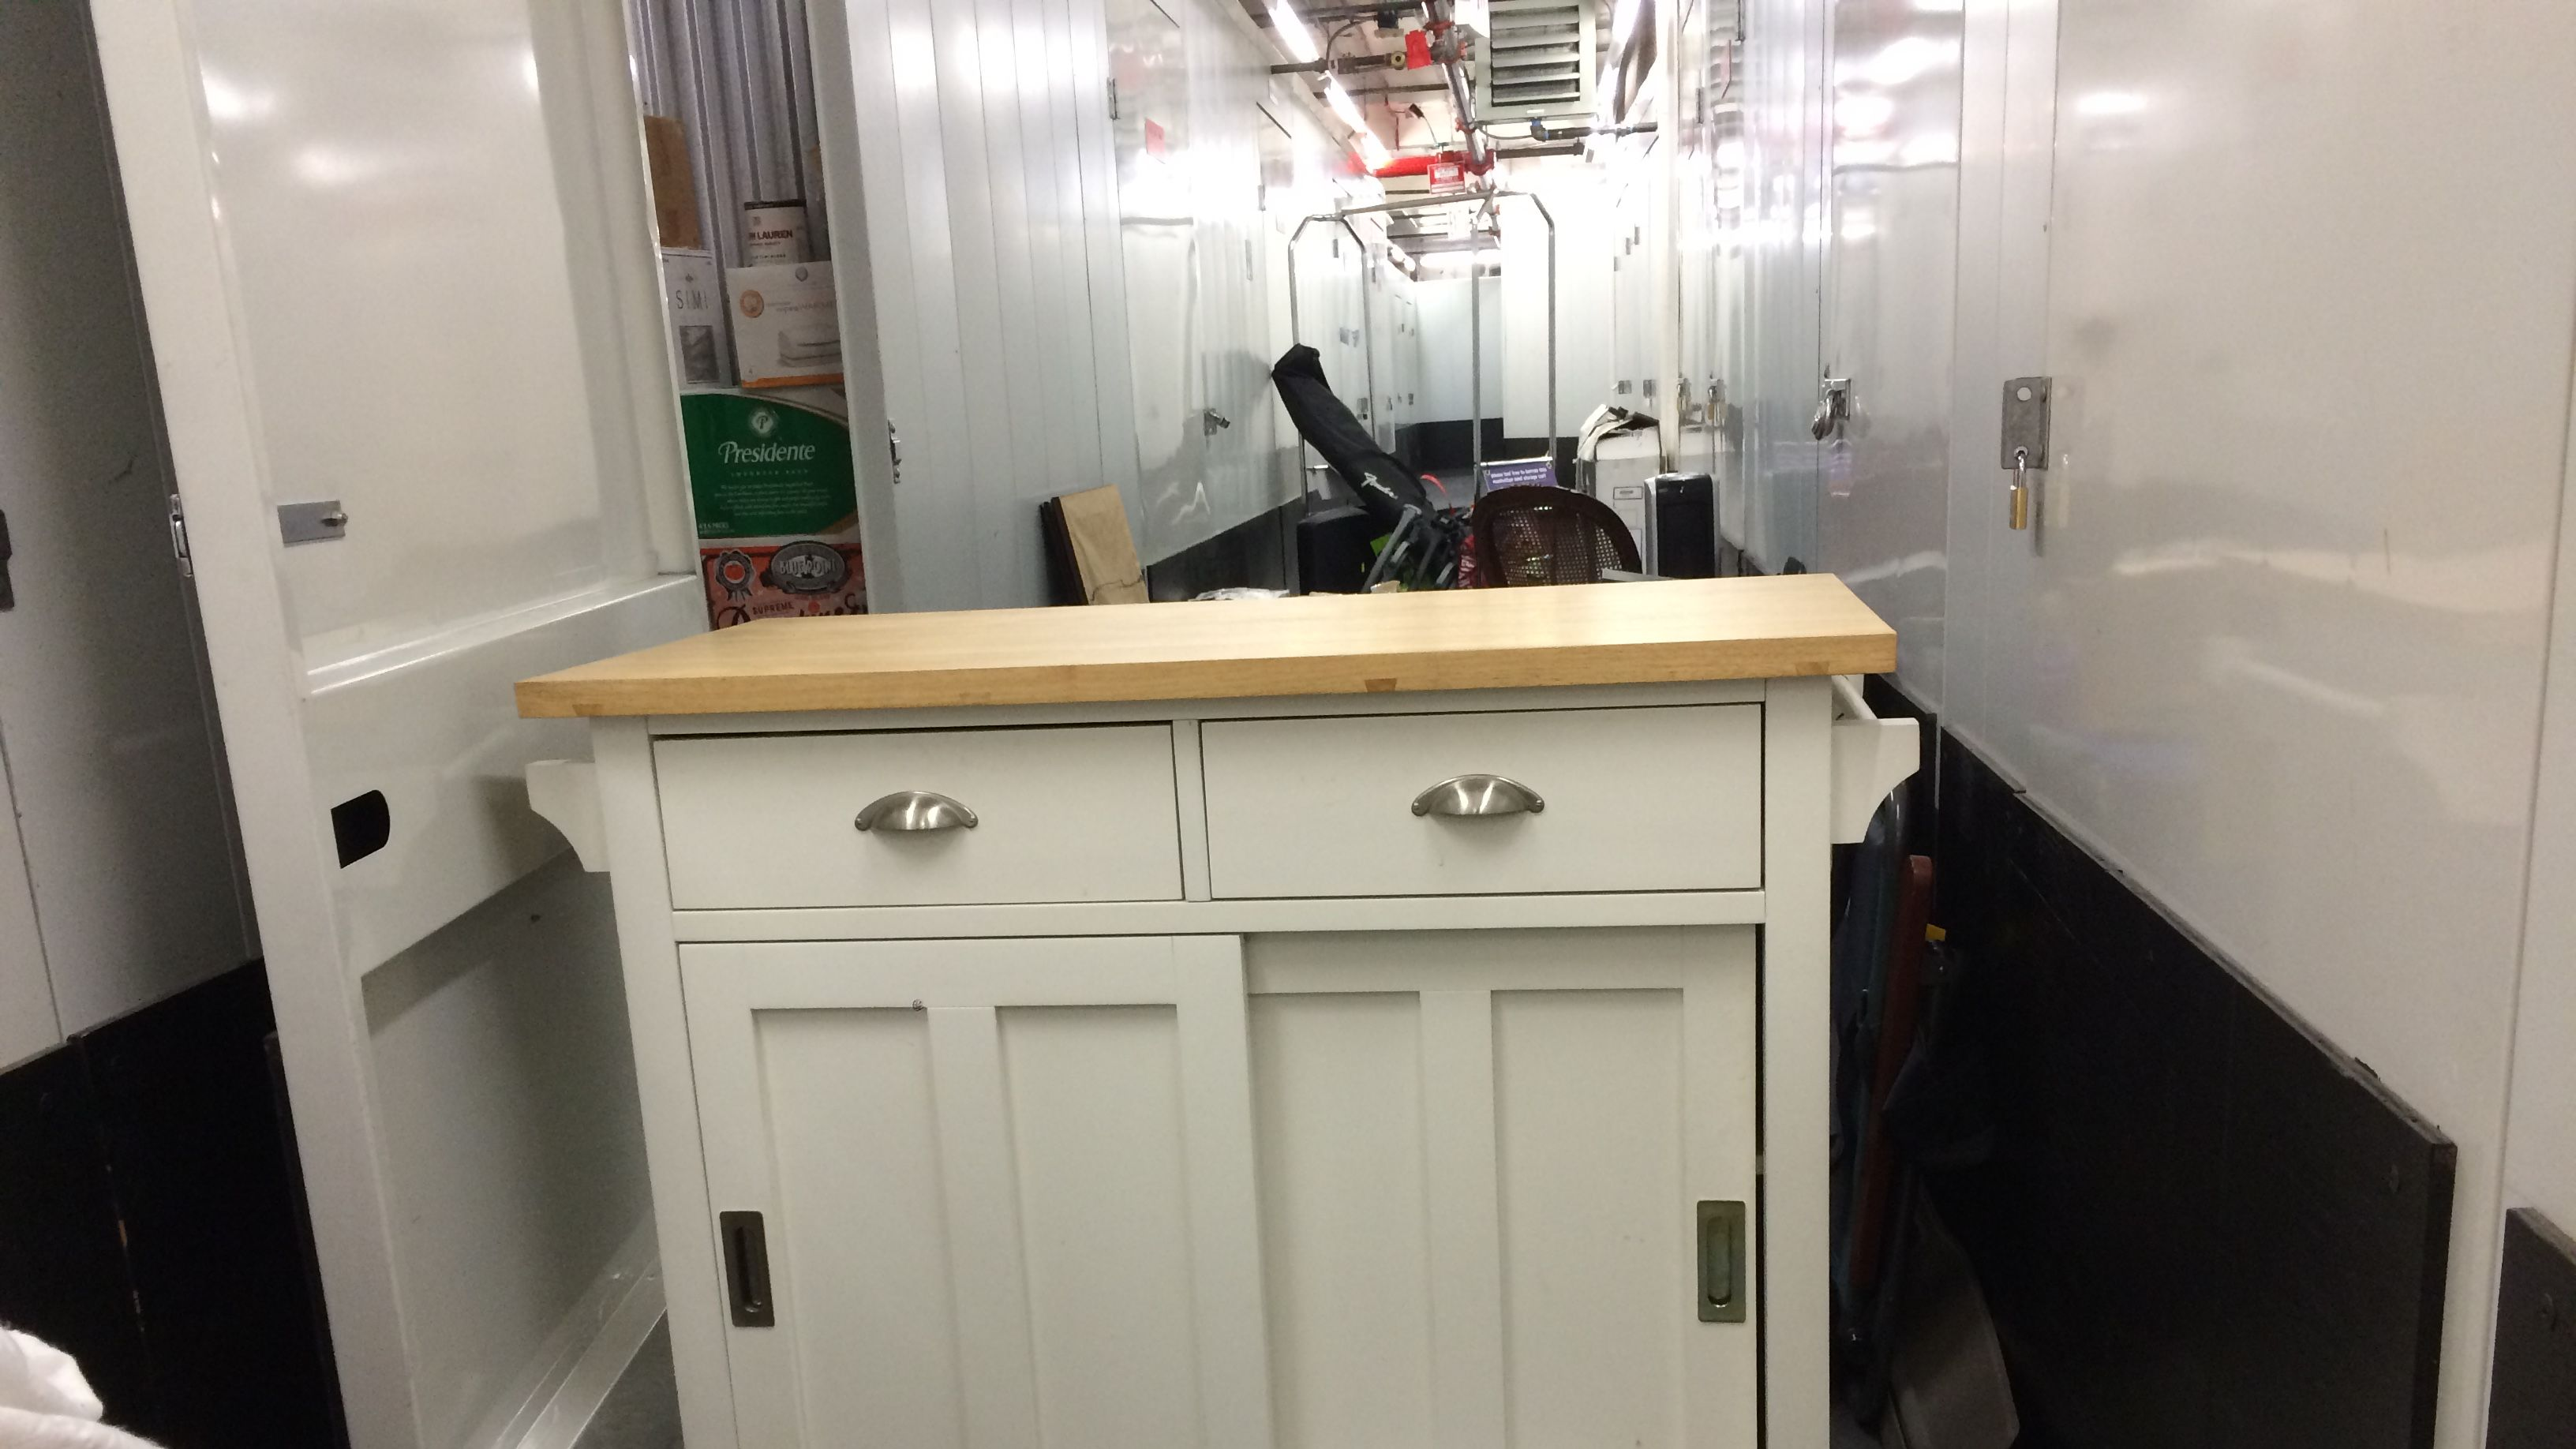 Belmont Kitchen Island Furniture Crate Barrel Apartment Therapy S Bazaar